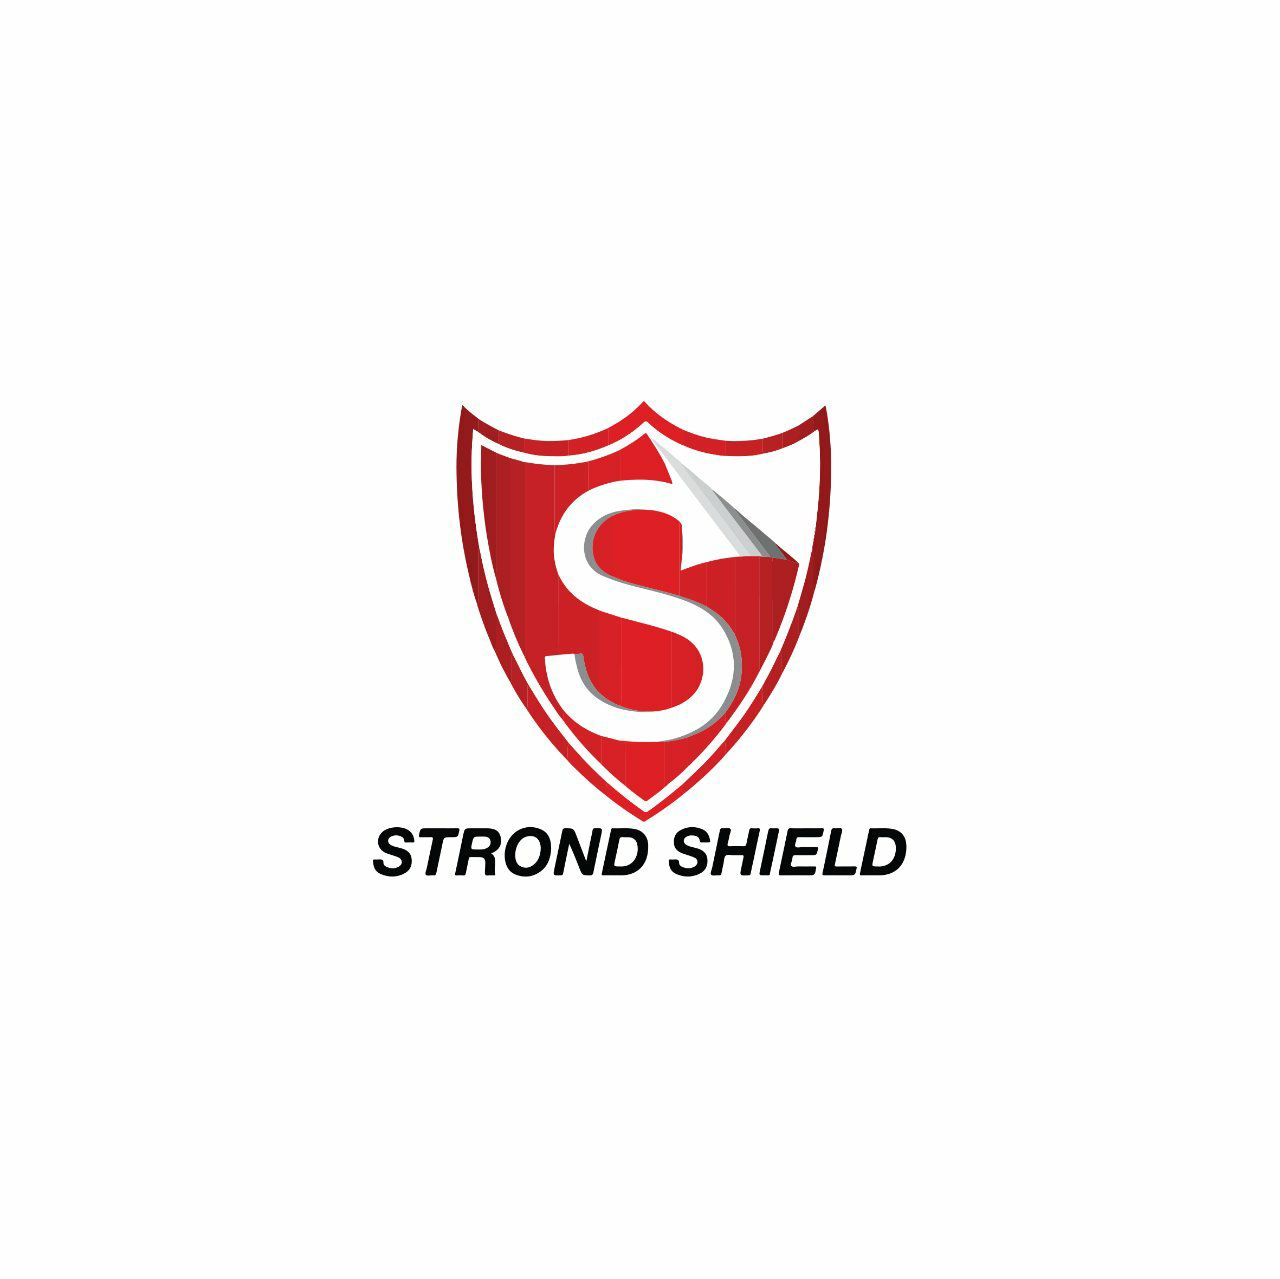 Strond Shield